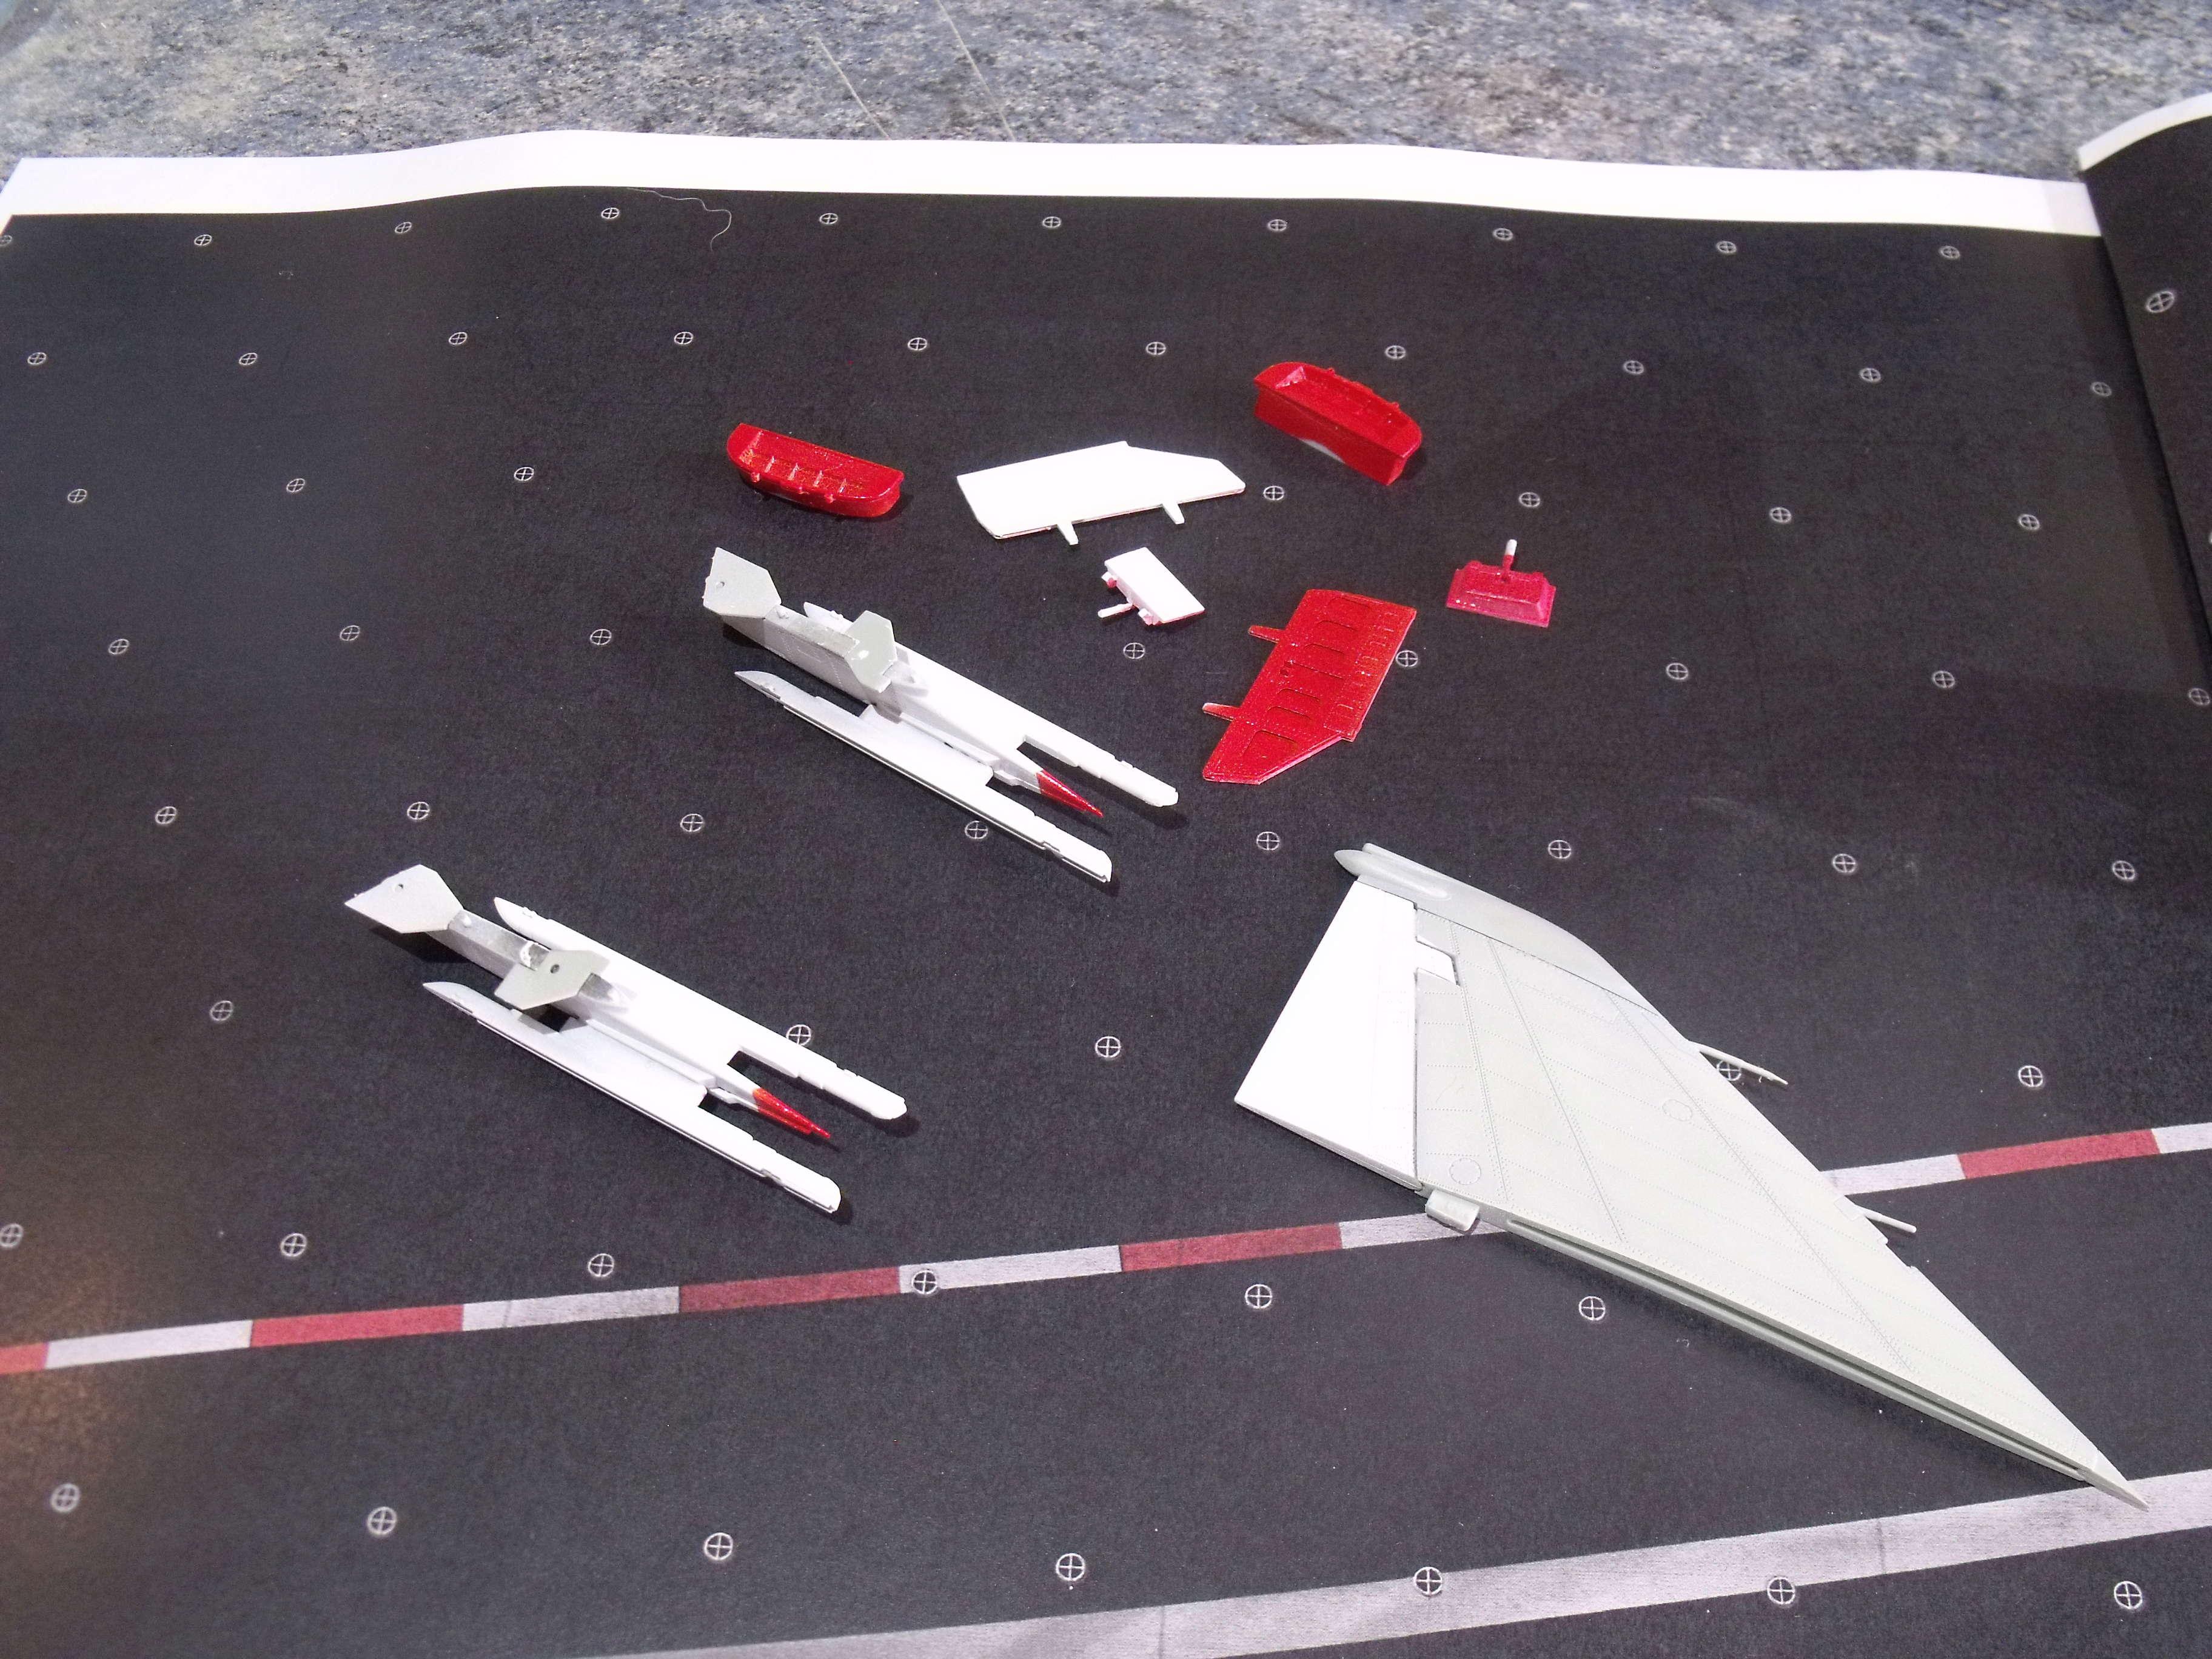 F-4 B Phantom 1/48° - VF-51 - 1972 - Début de patine. - Page 4 Dscf7138